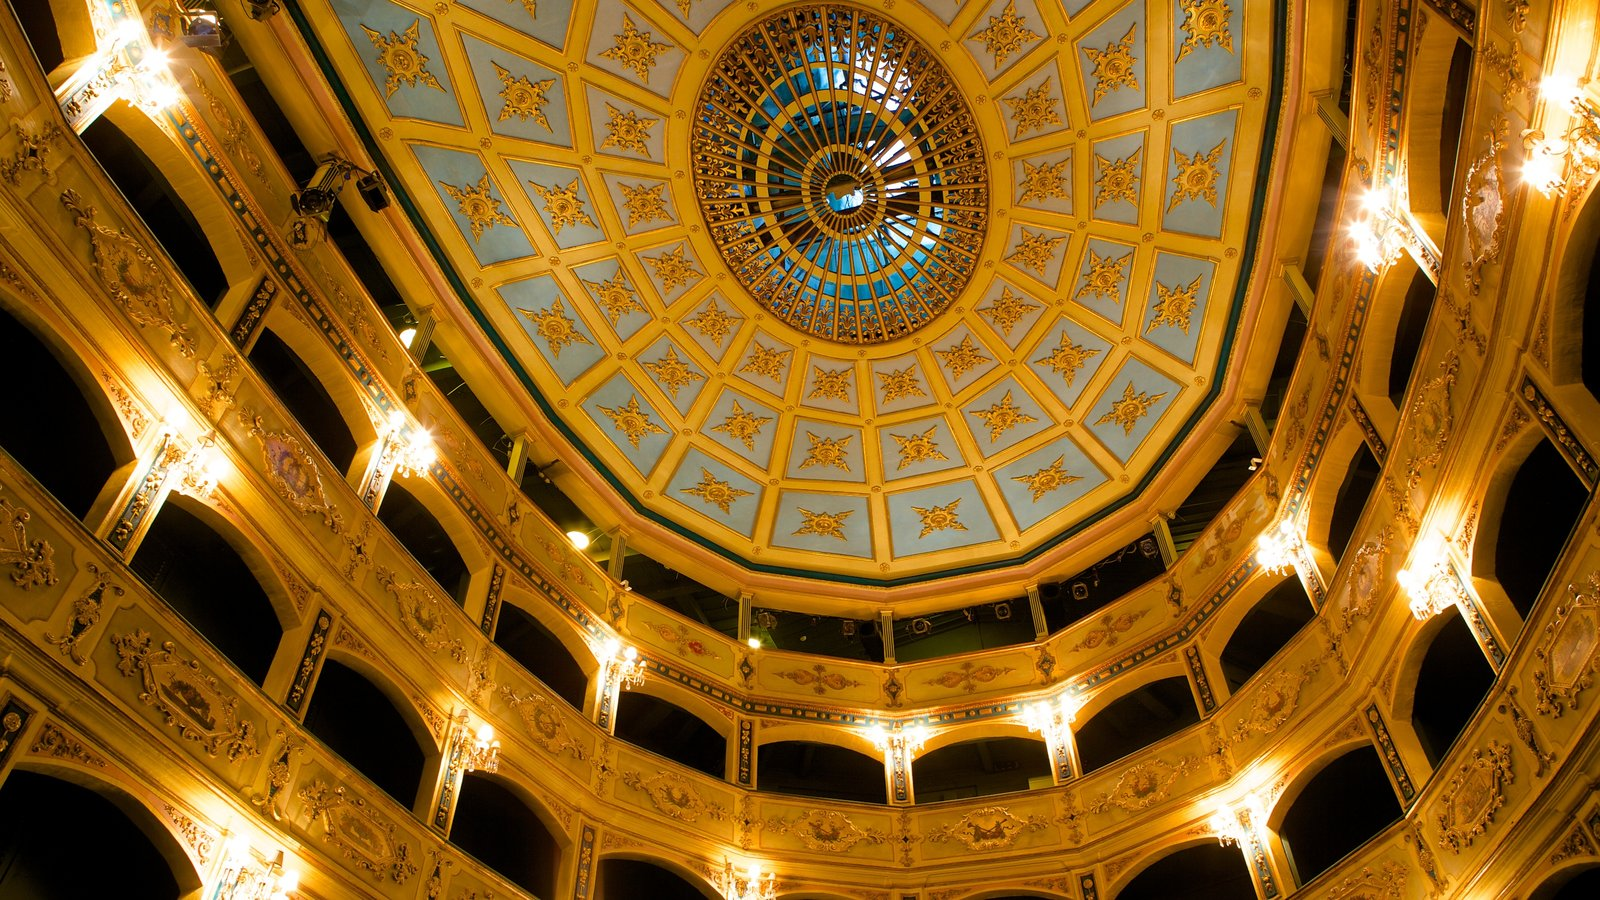 Teatro Manoel que inclui vistas internas, cenas de teatro e arquitetura de patrimônio